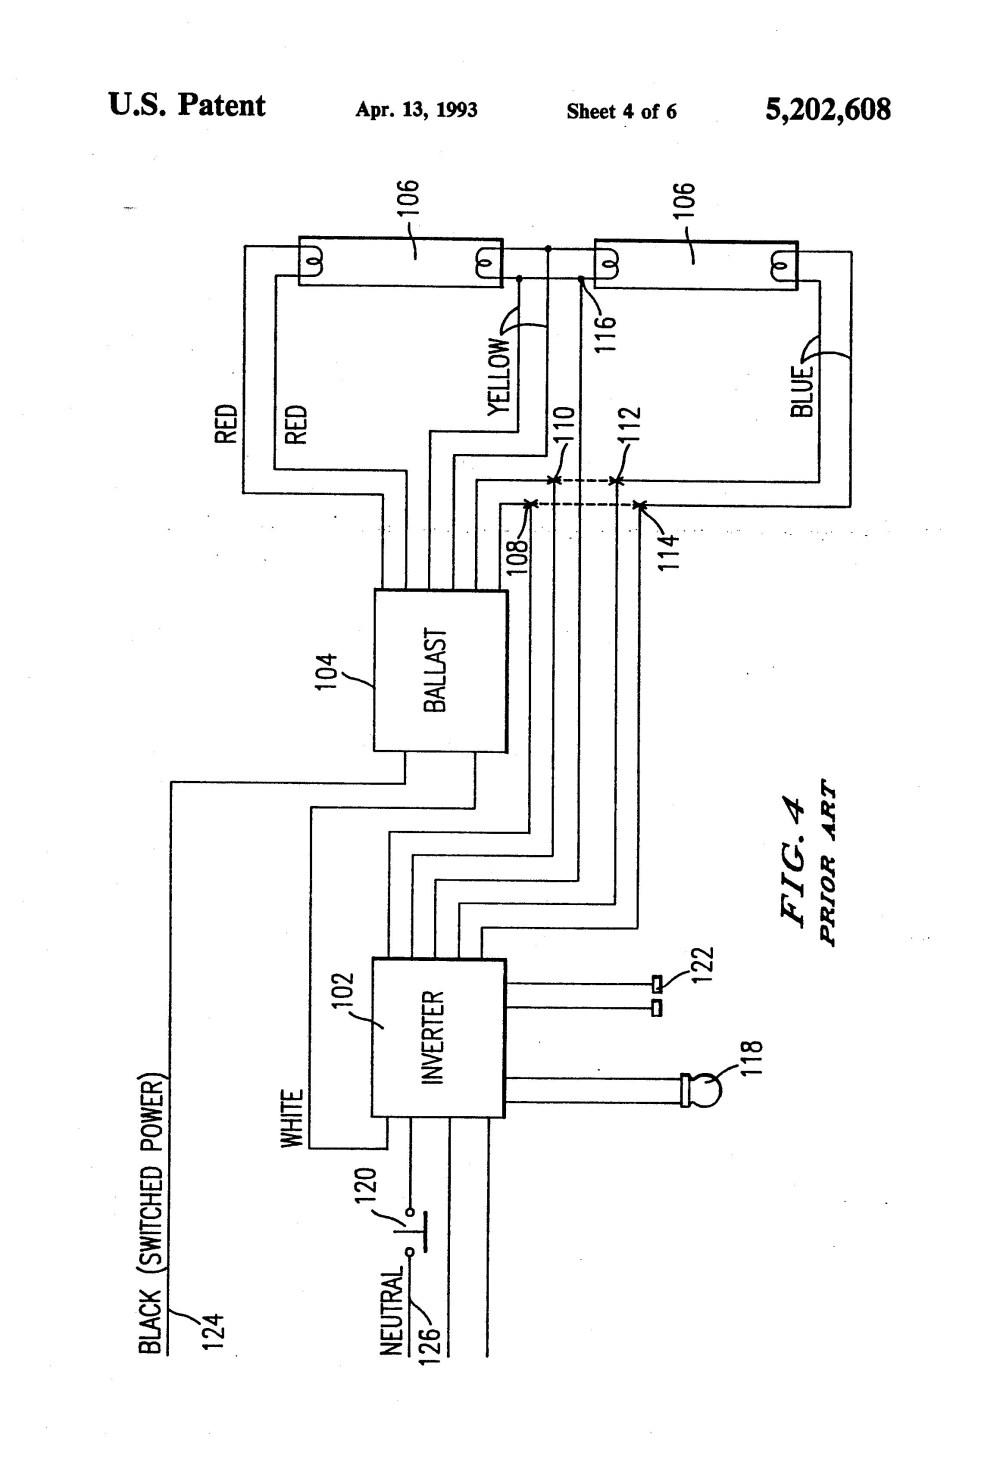 medium resolution of lithonia emergency light wiring diagram wiring diagram for lithonia lighting new emergency exit lights wiring